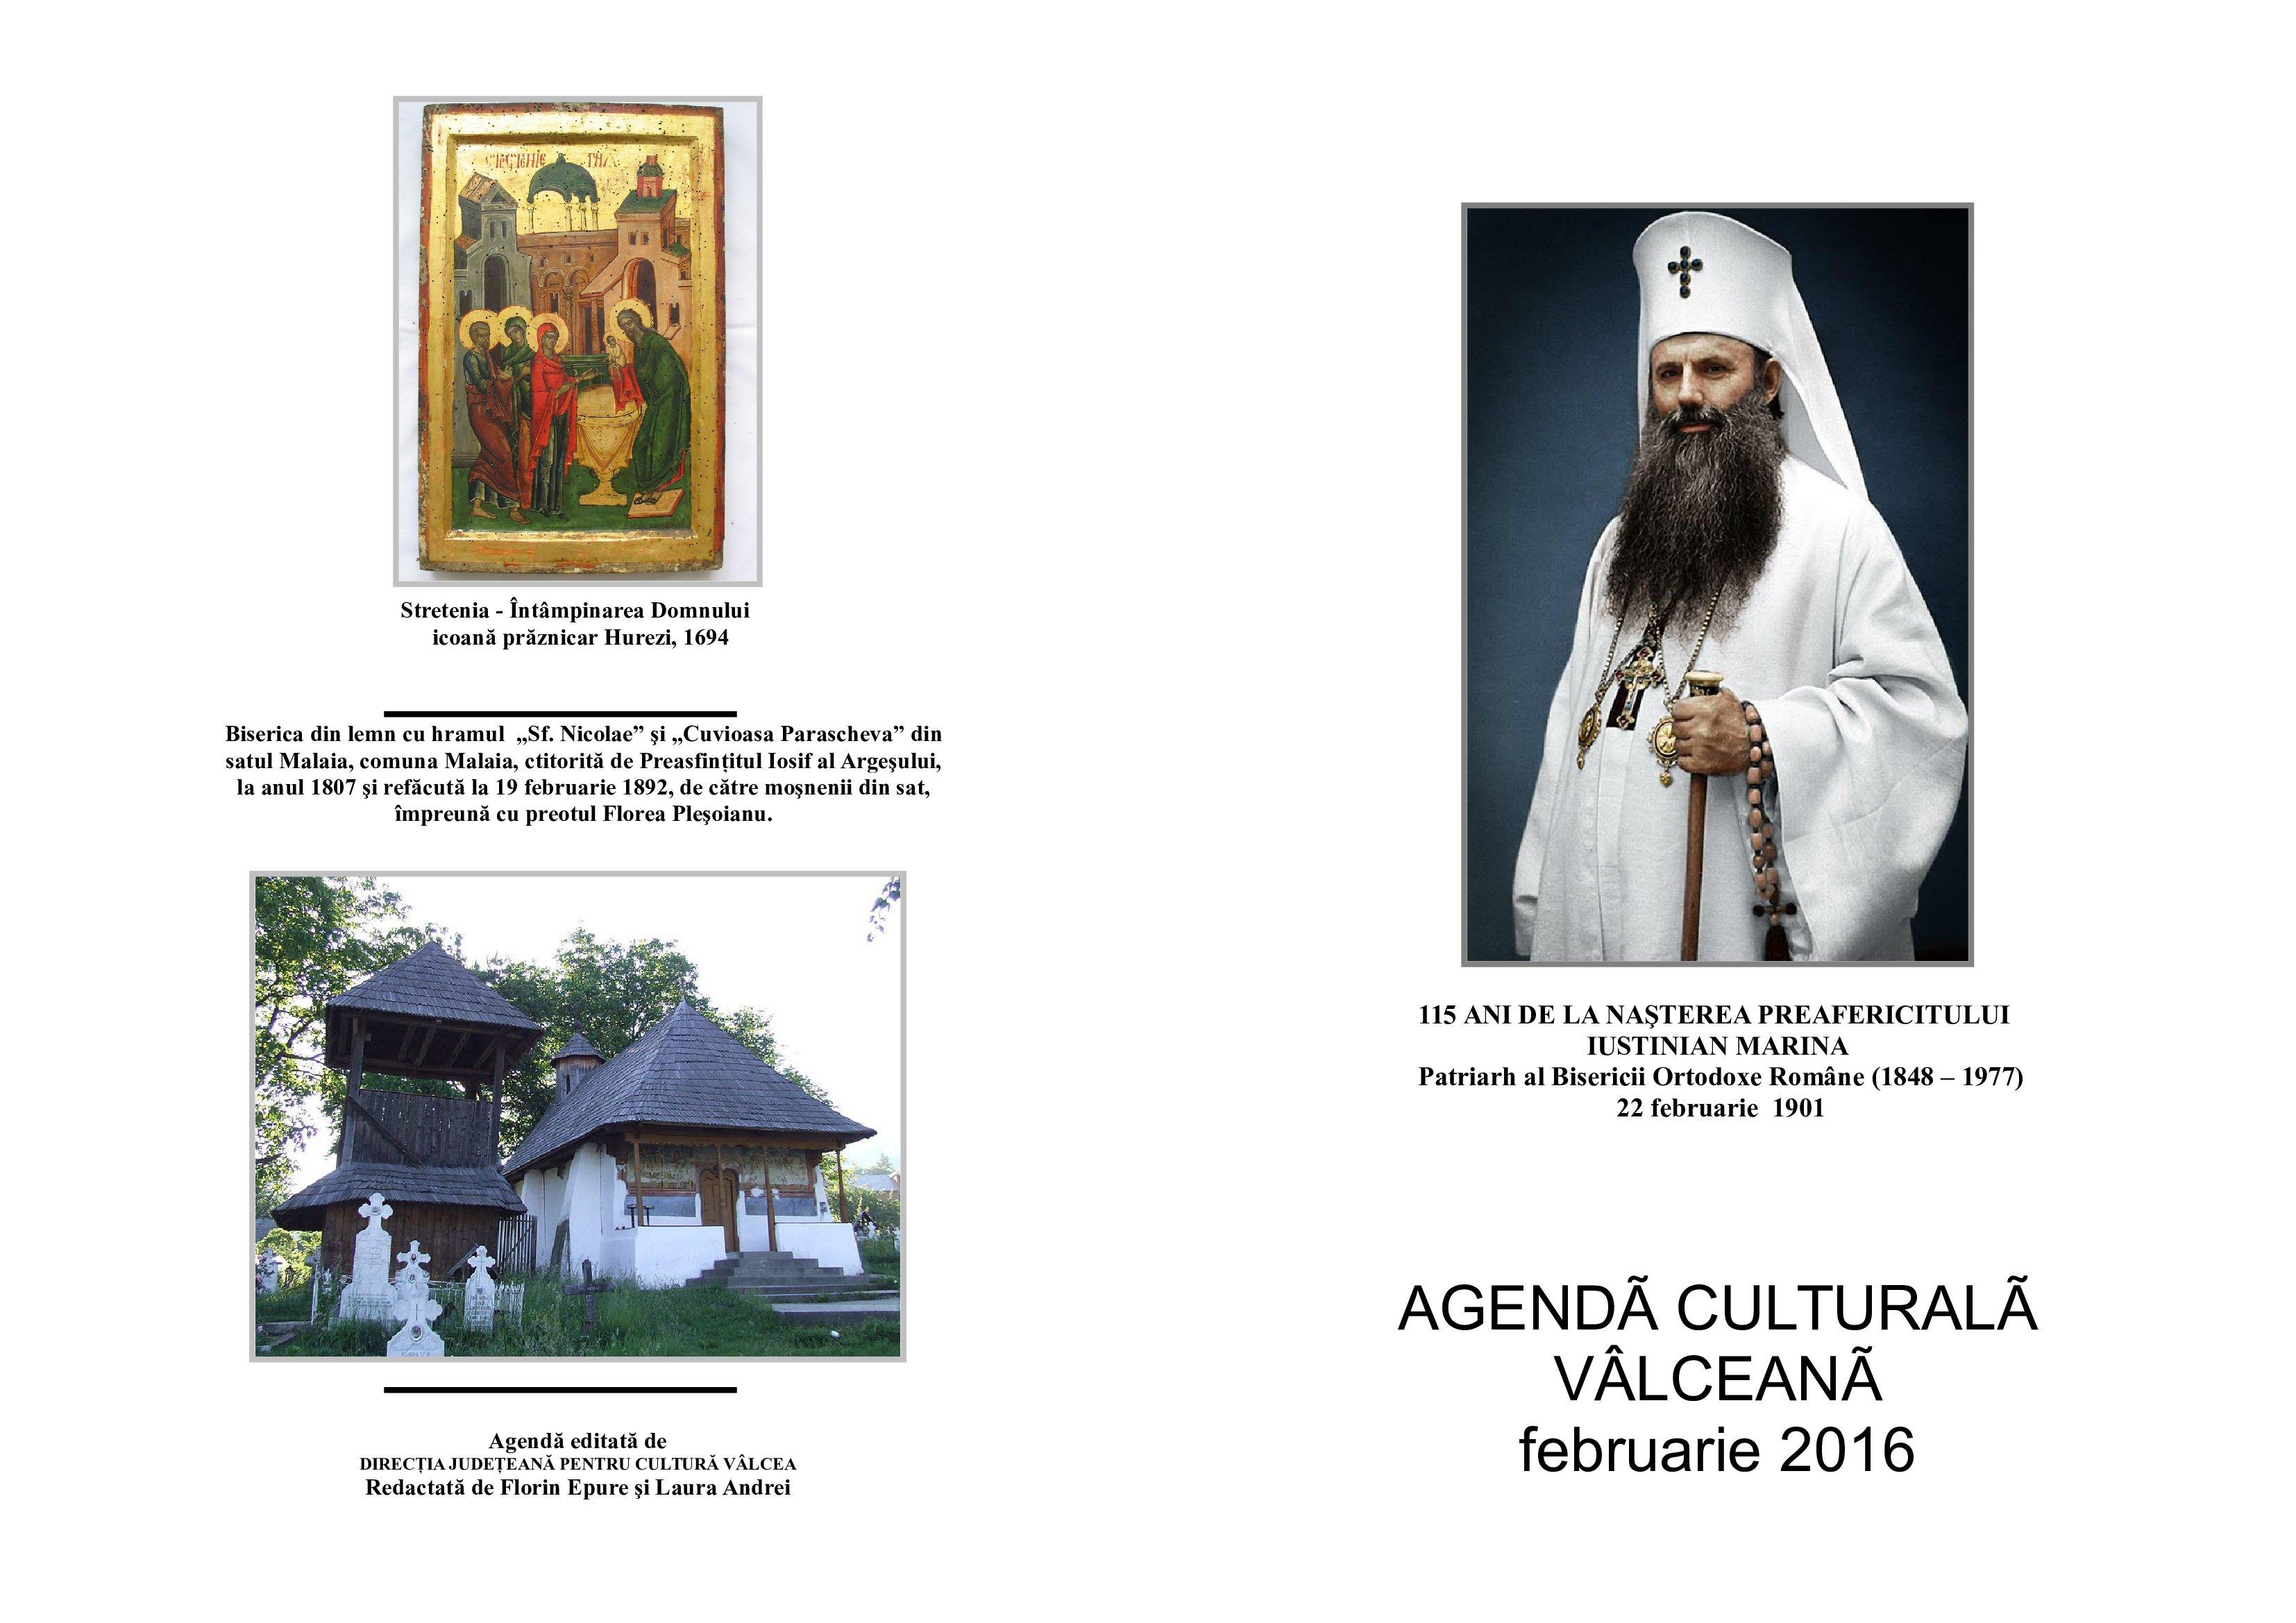 Agenda Culturala Valceana, februarie 2016